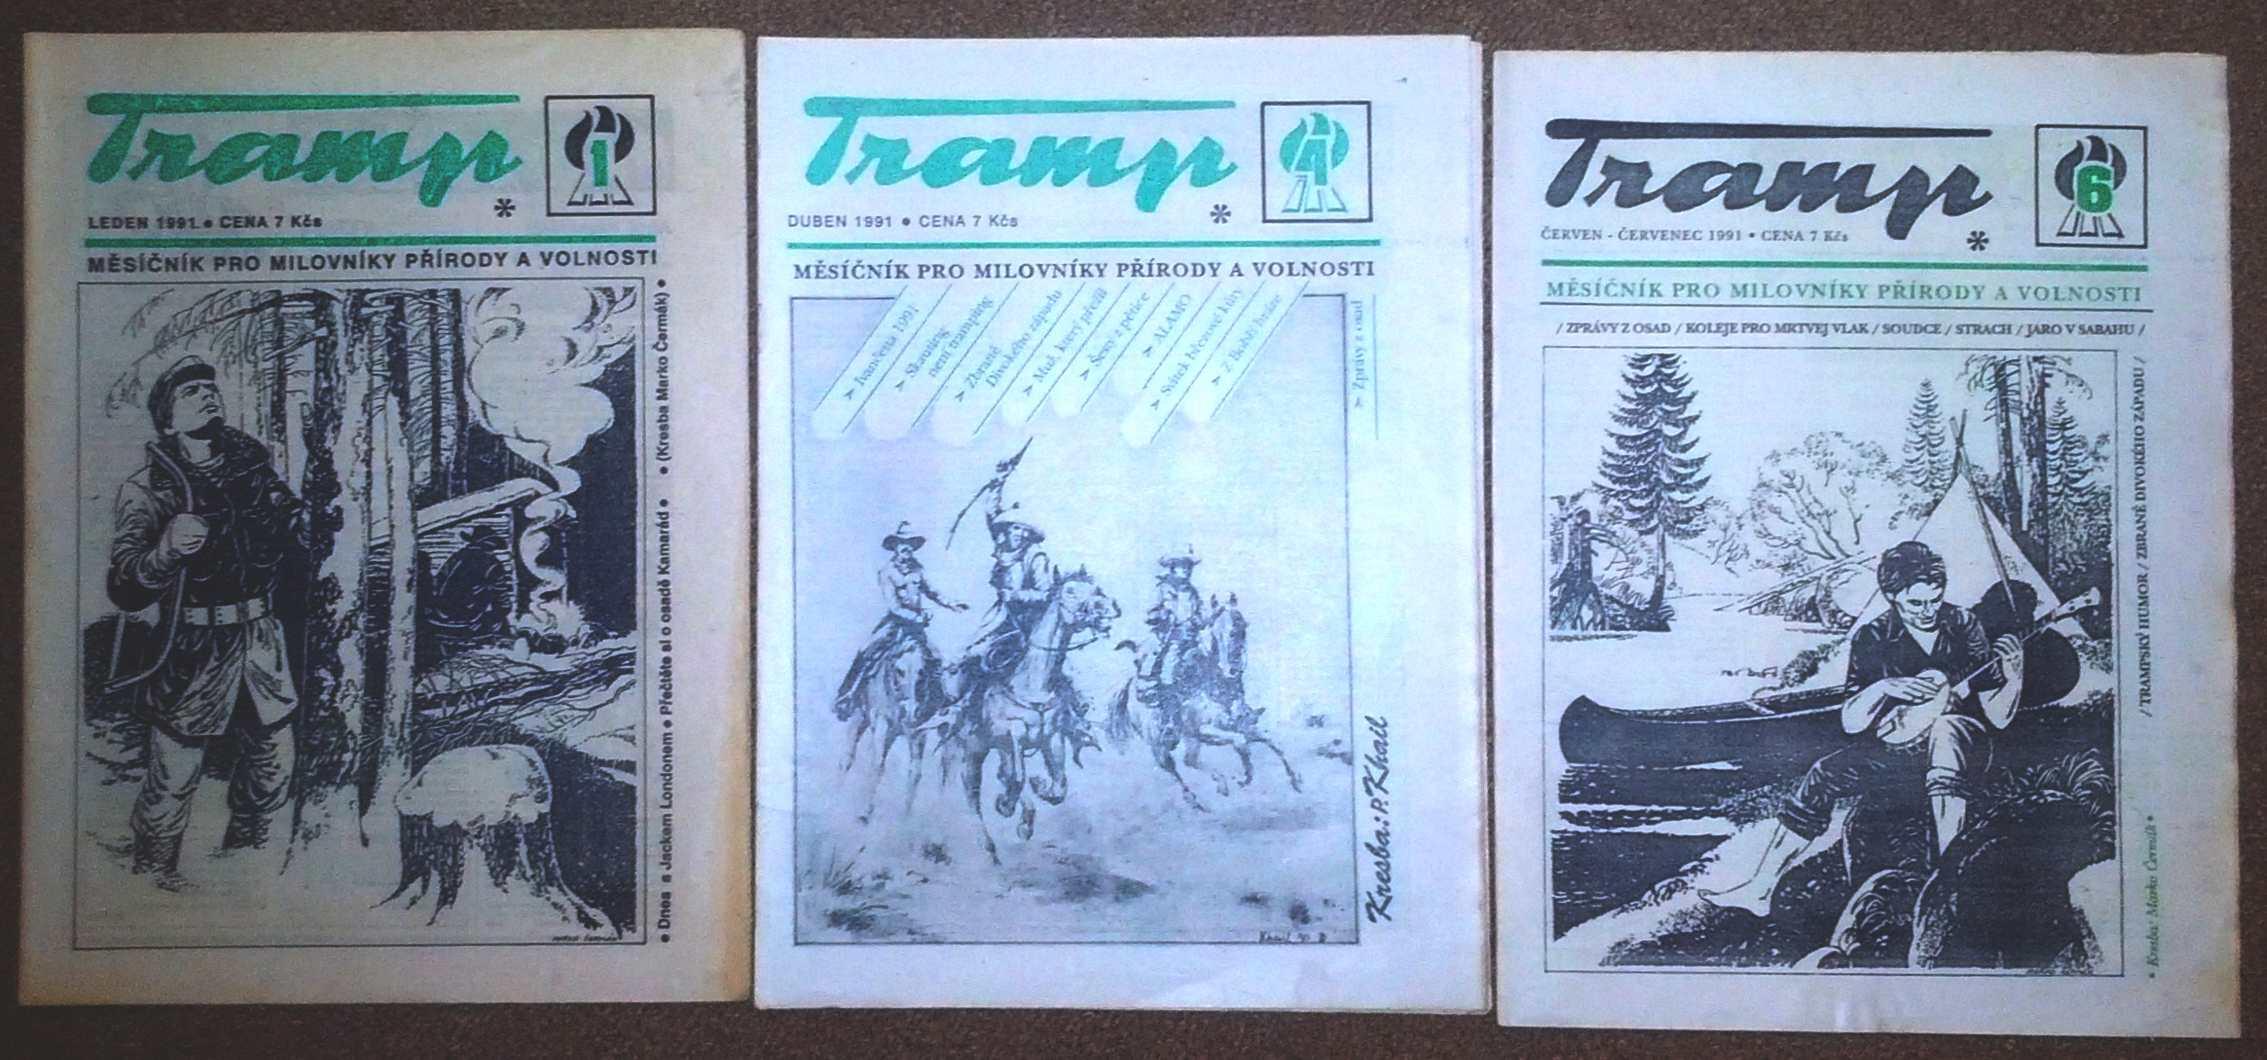 TRAMP_1991_010406